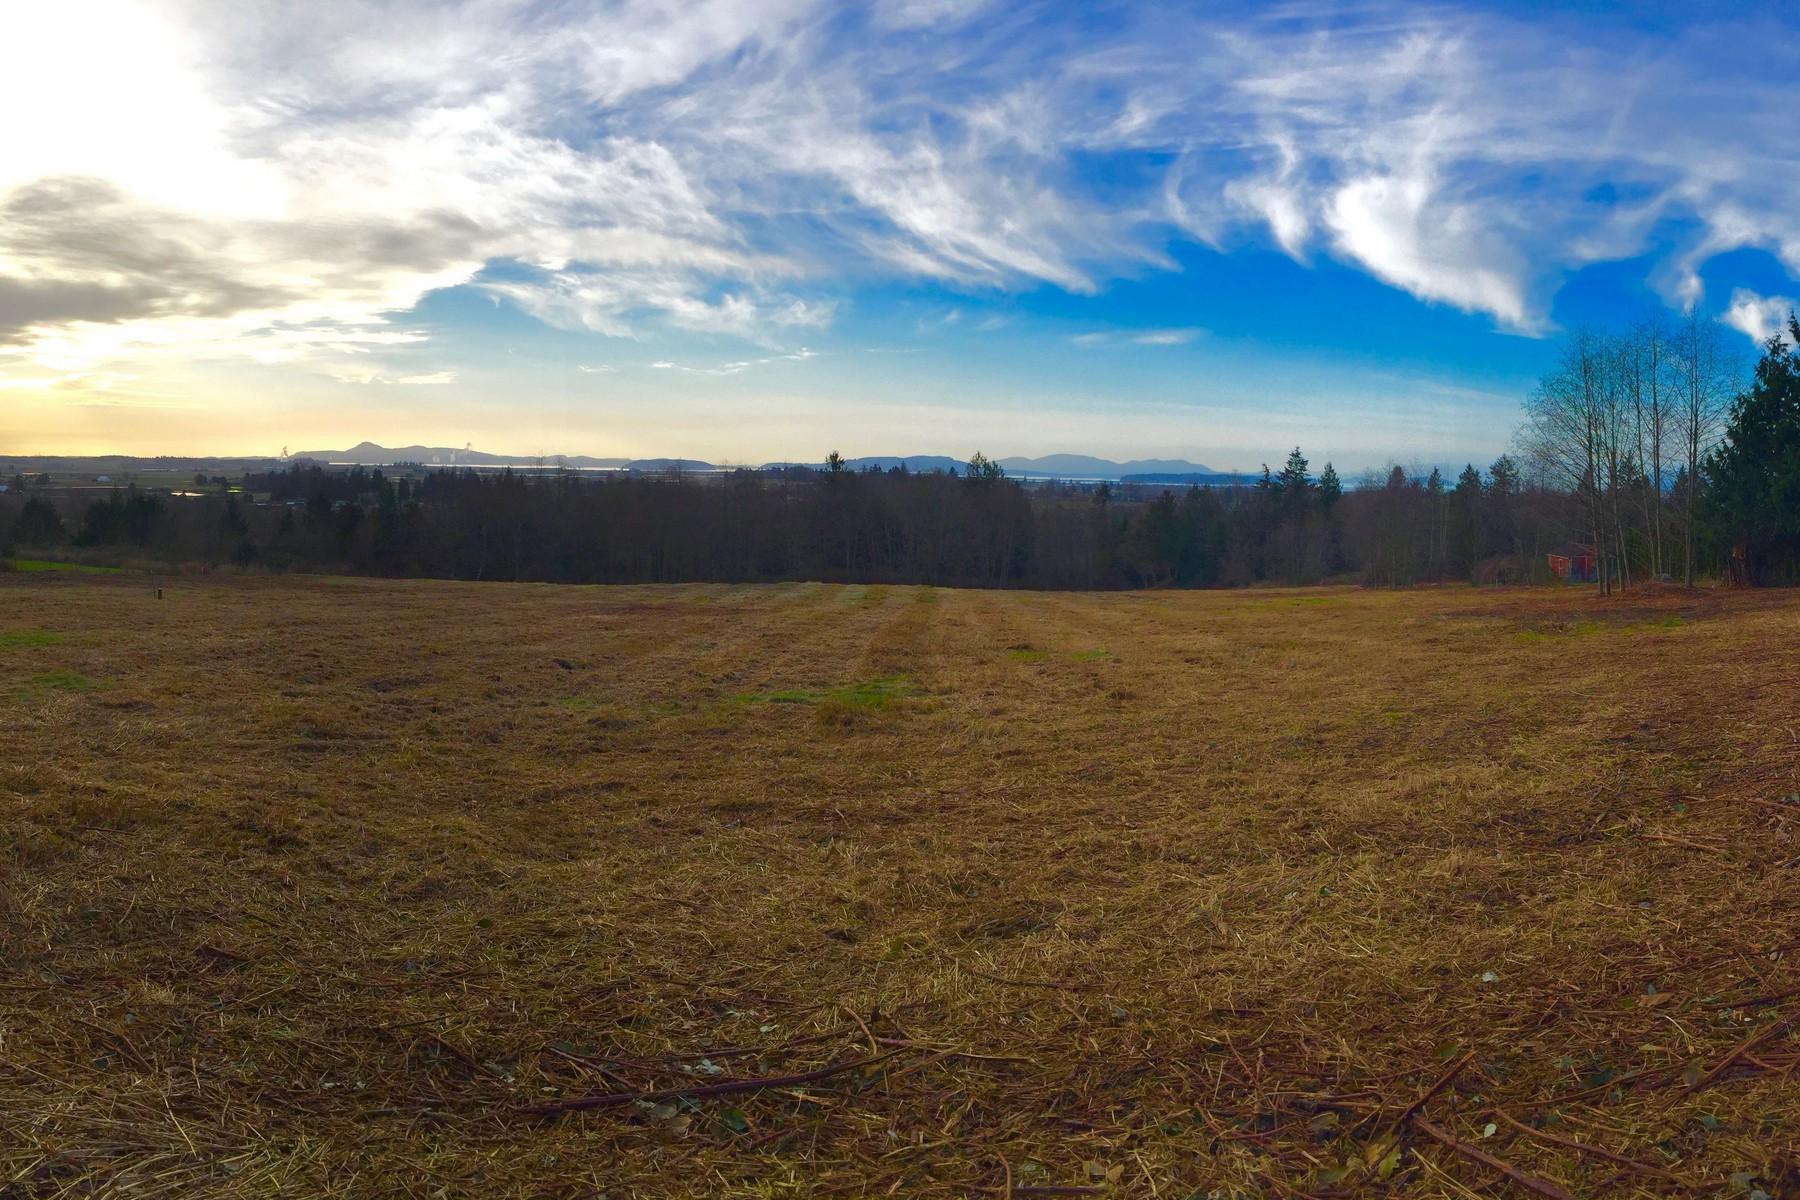 Land for Sale at Outstanding 5 Acres in Bow Washington XXXX Cedar Drive Bow, Washington, 98232 United States